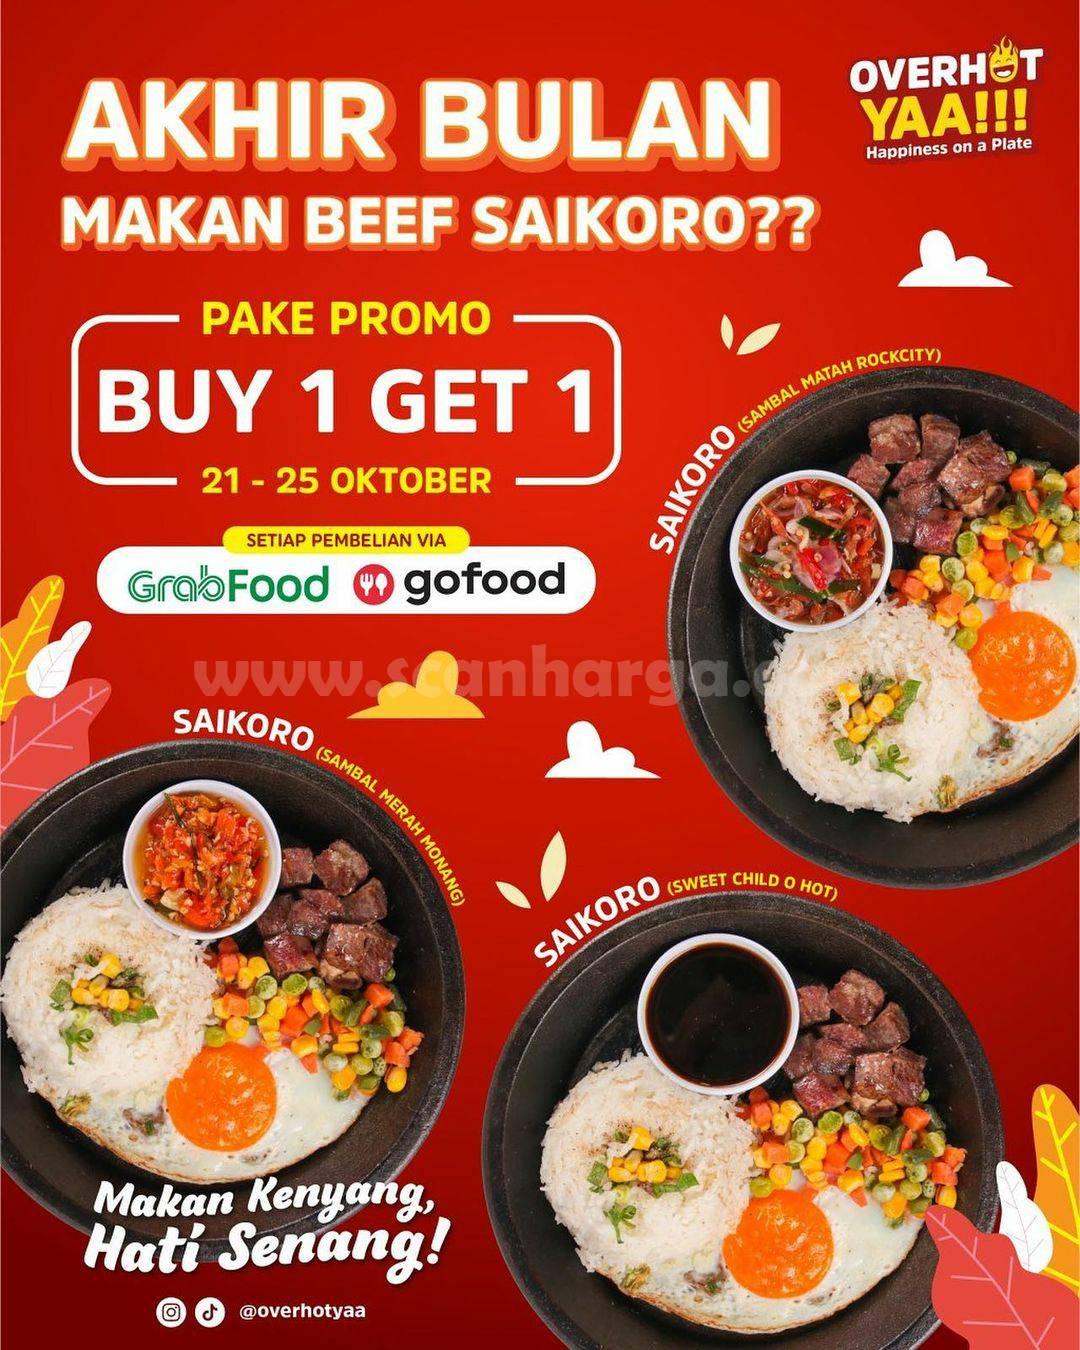 Promo Overhot Yaa Buy 1 Get 1 Setiap Pembelian via Gofood dan Grabfood